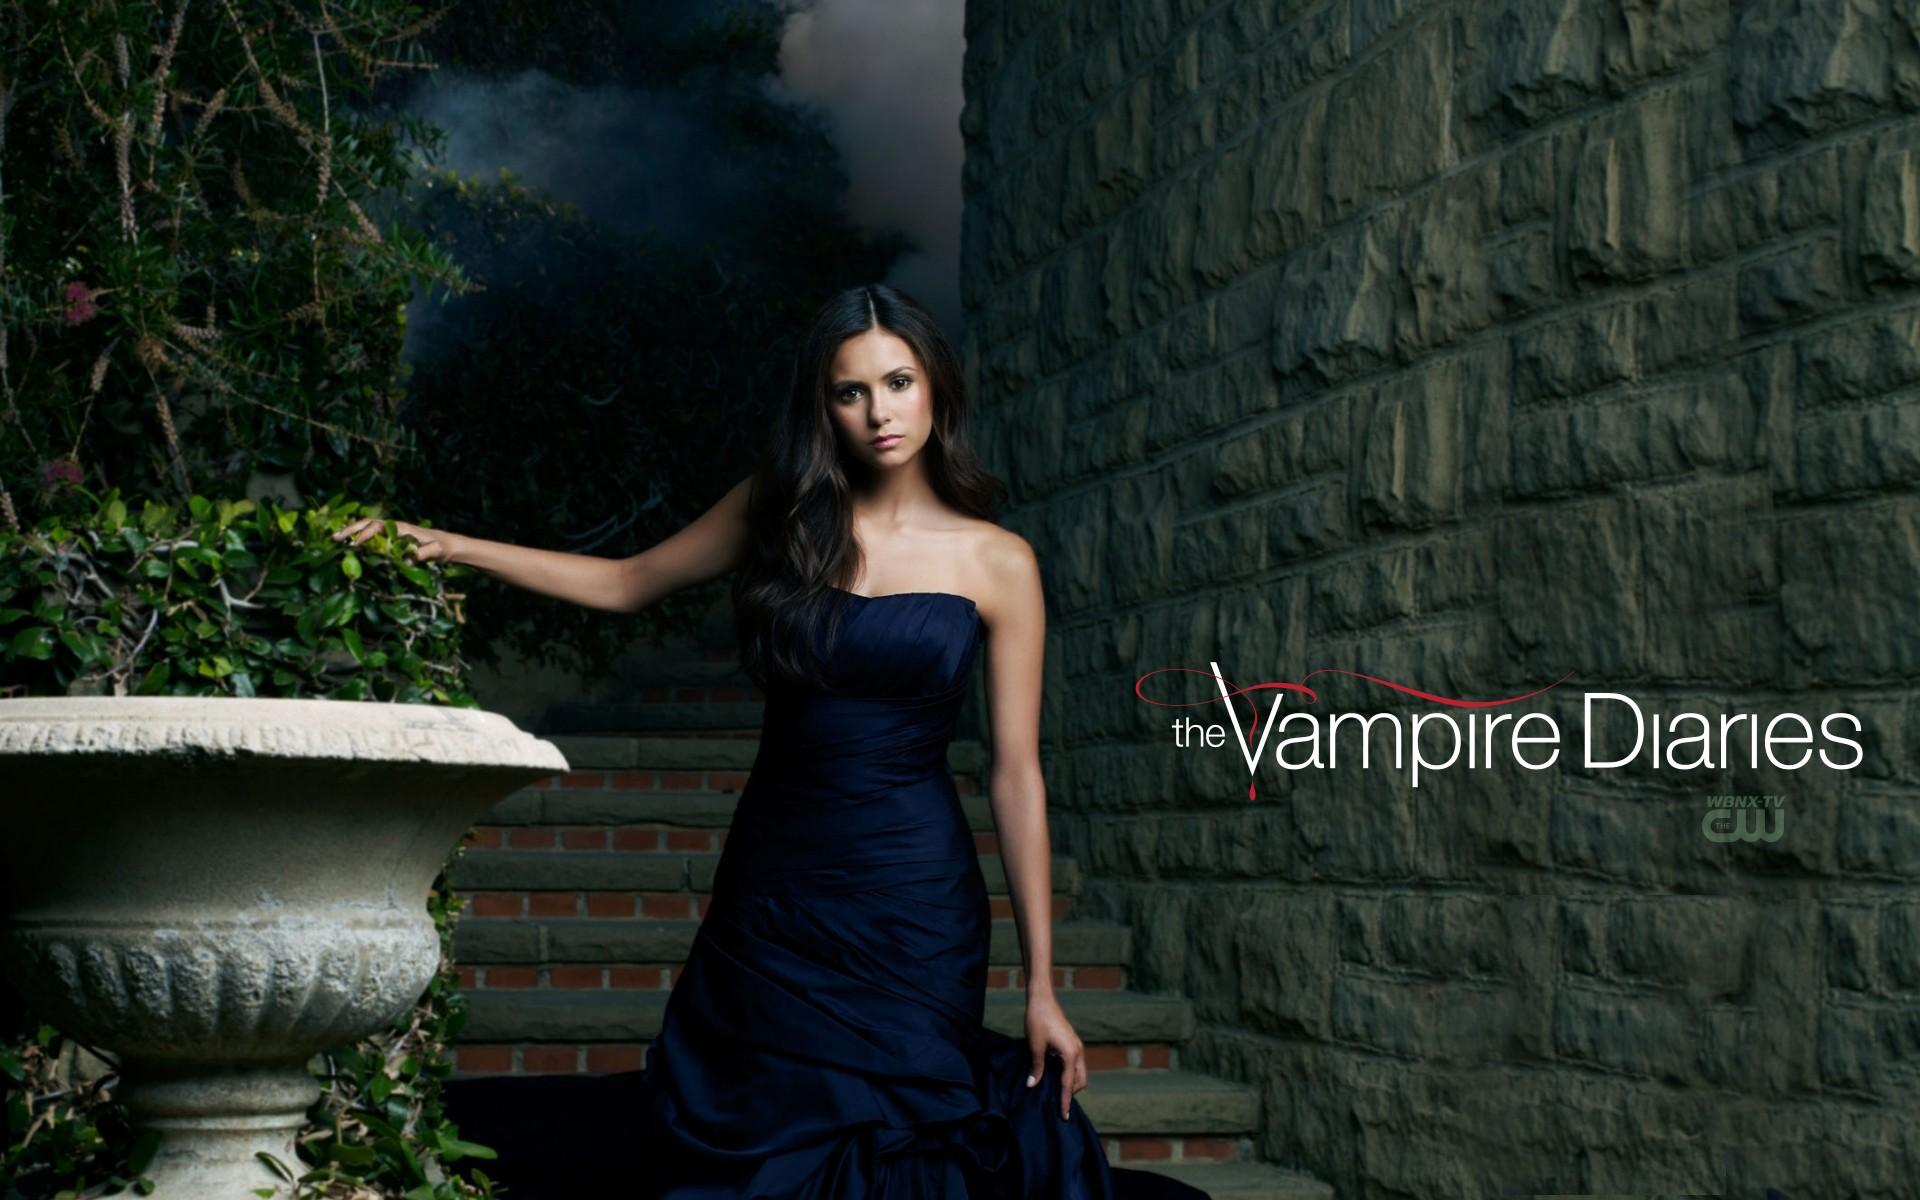 Wallpaper dedicato a Nina Dobrev per la 2 season di Vampire Diaries